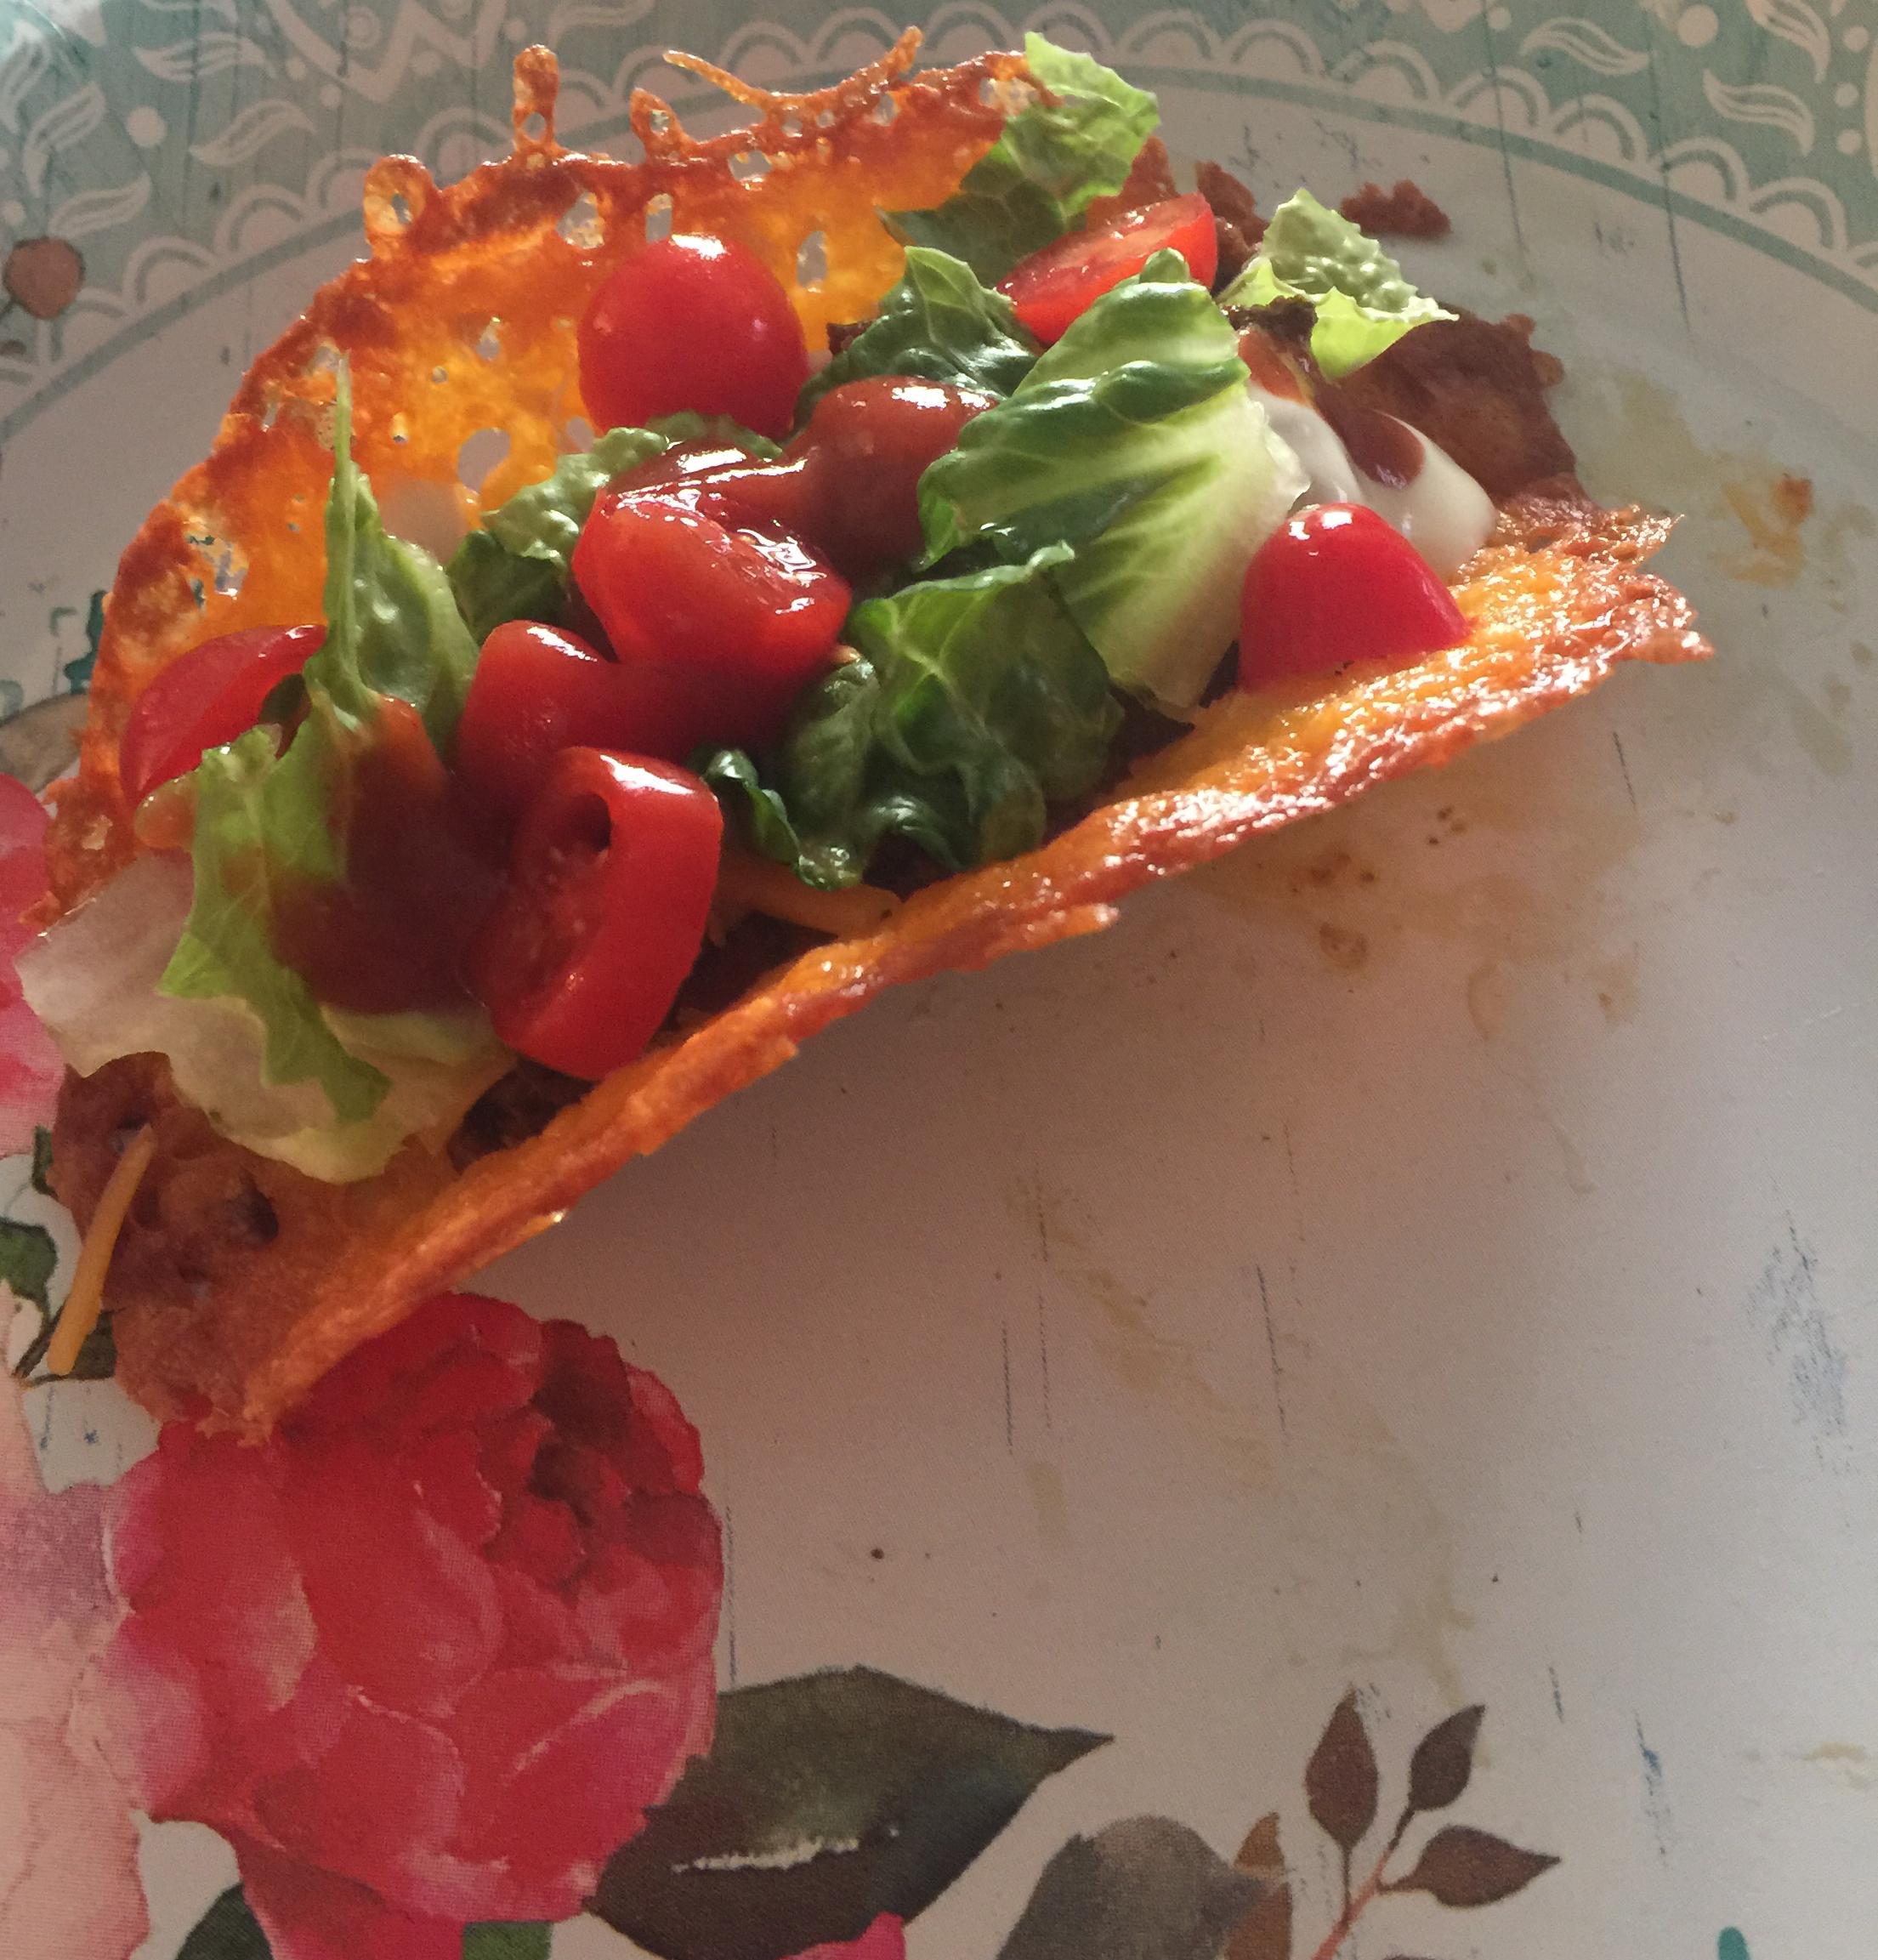 Low-Carb Keto Cheese Taco Shells